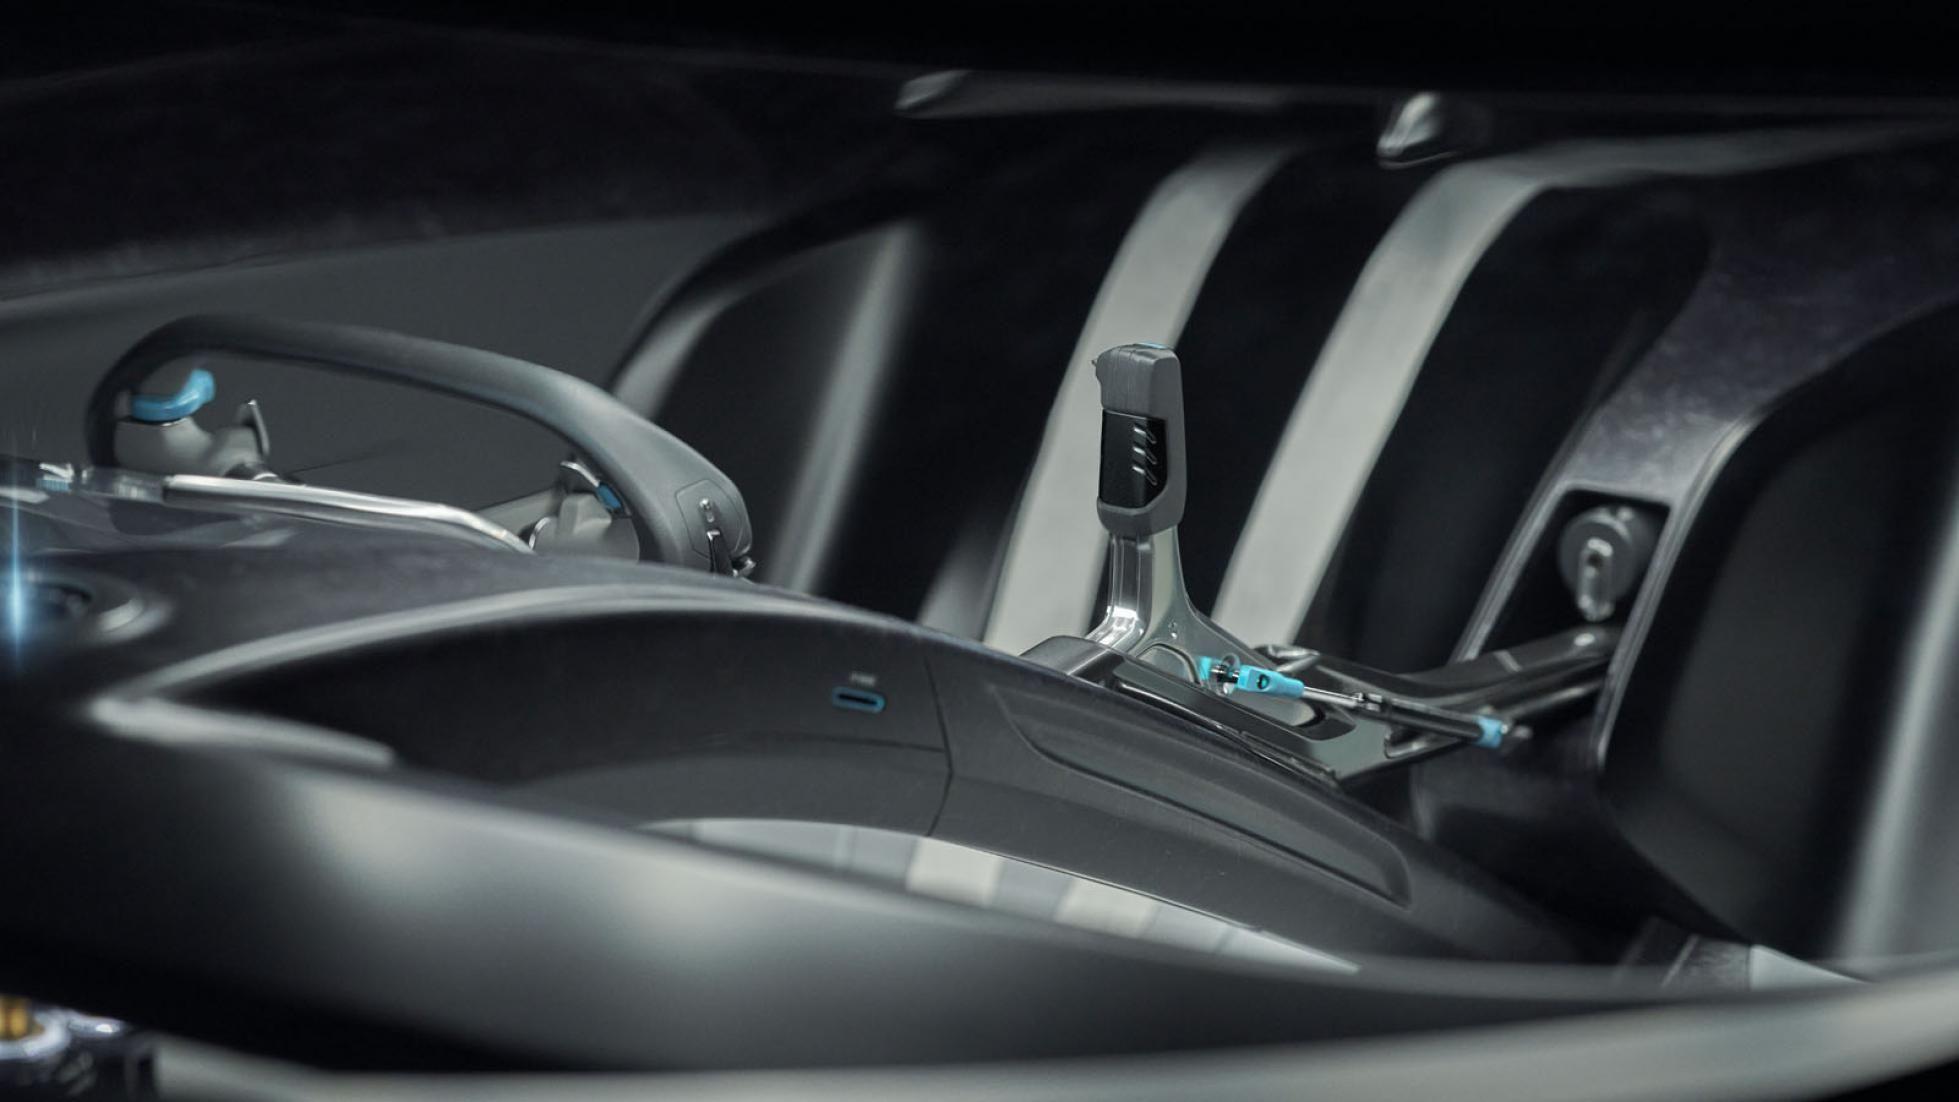 Jaguar Vision GT SV 9 carro elétrico, Gran Turismo, Gran Turismo Sport, GT, Jaguar, Jaguar Vision GT SV